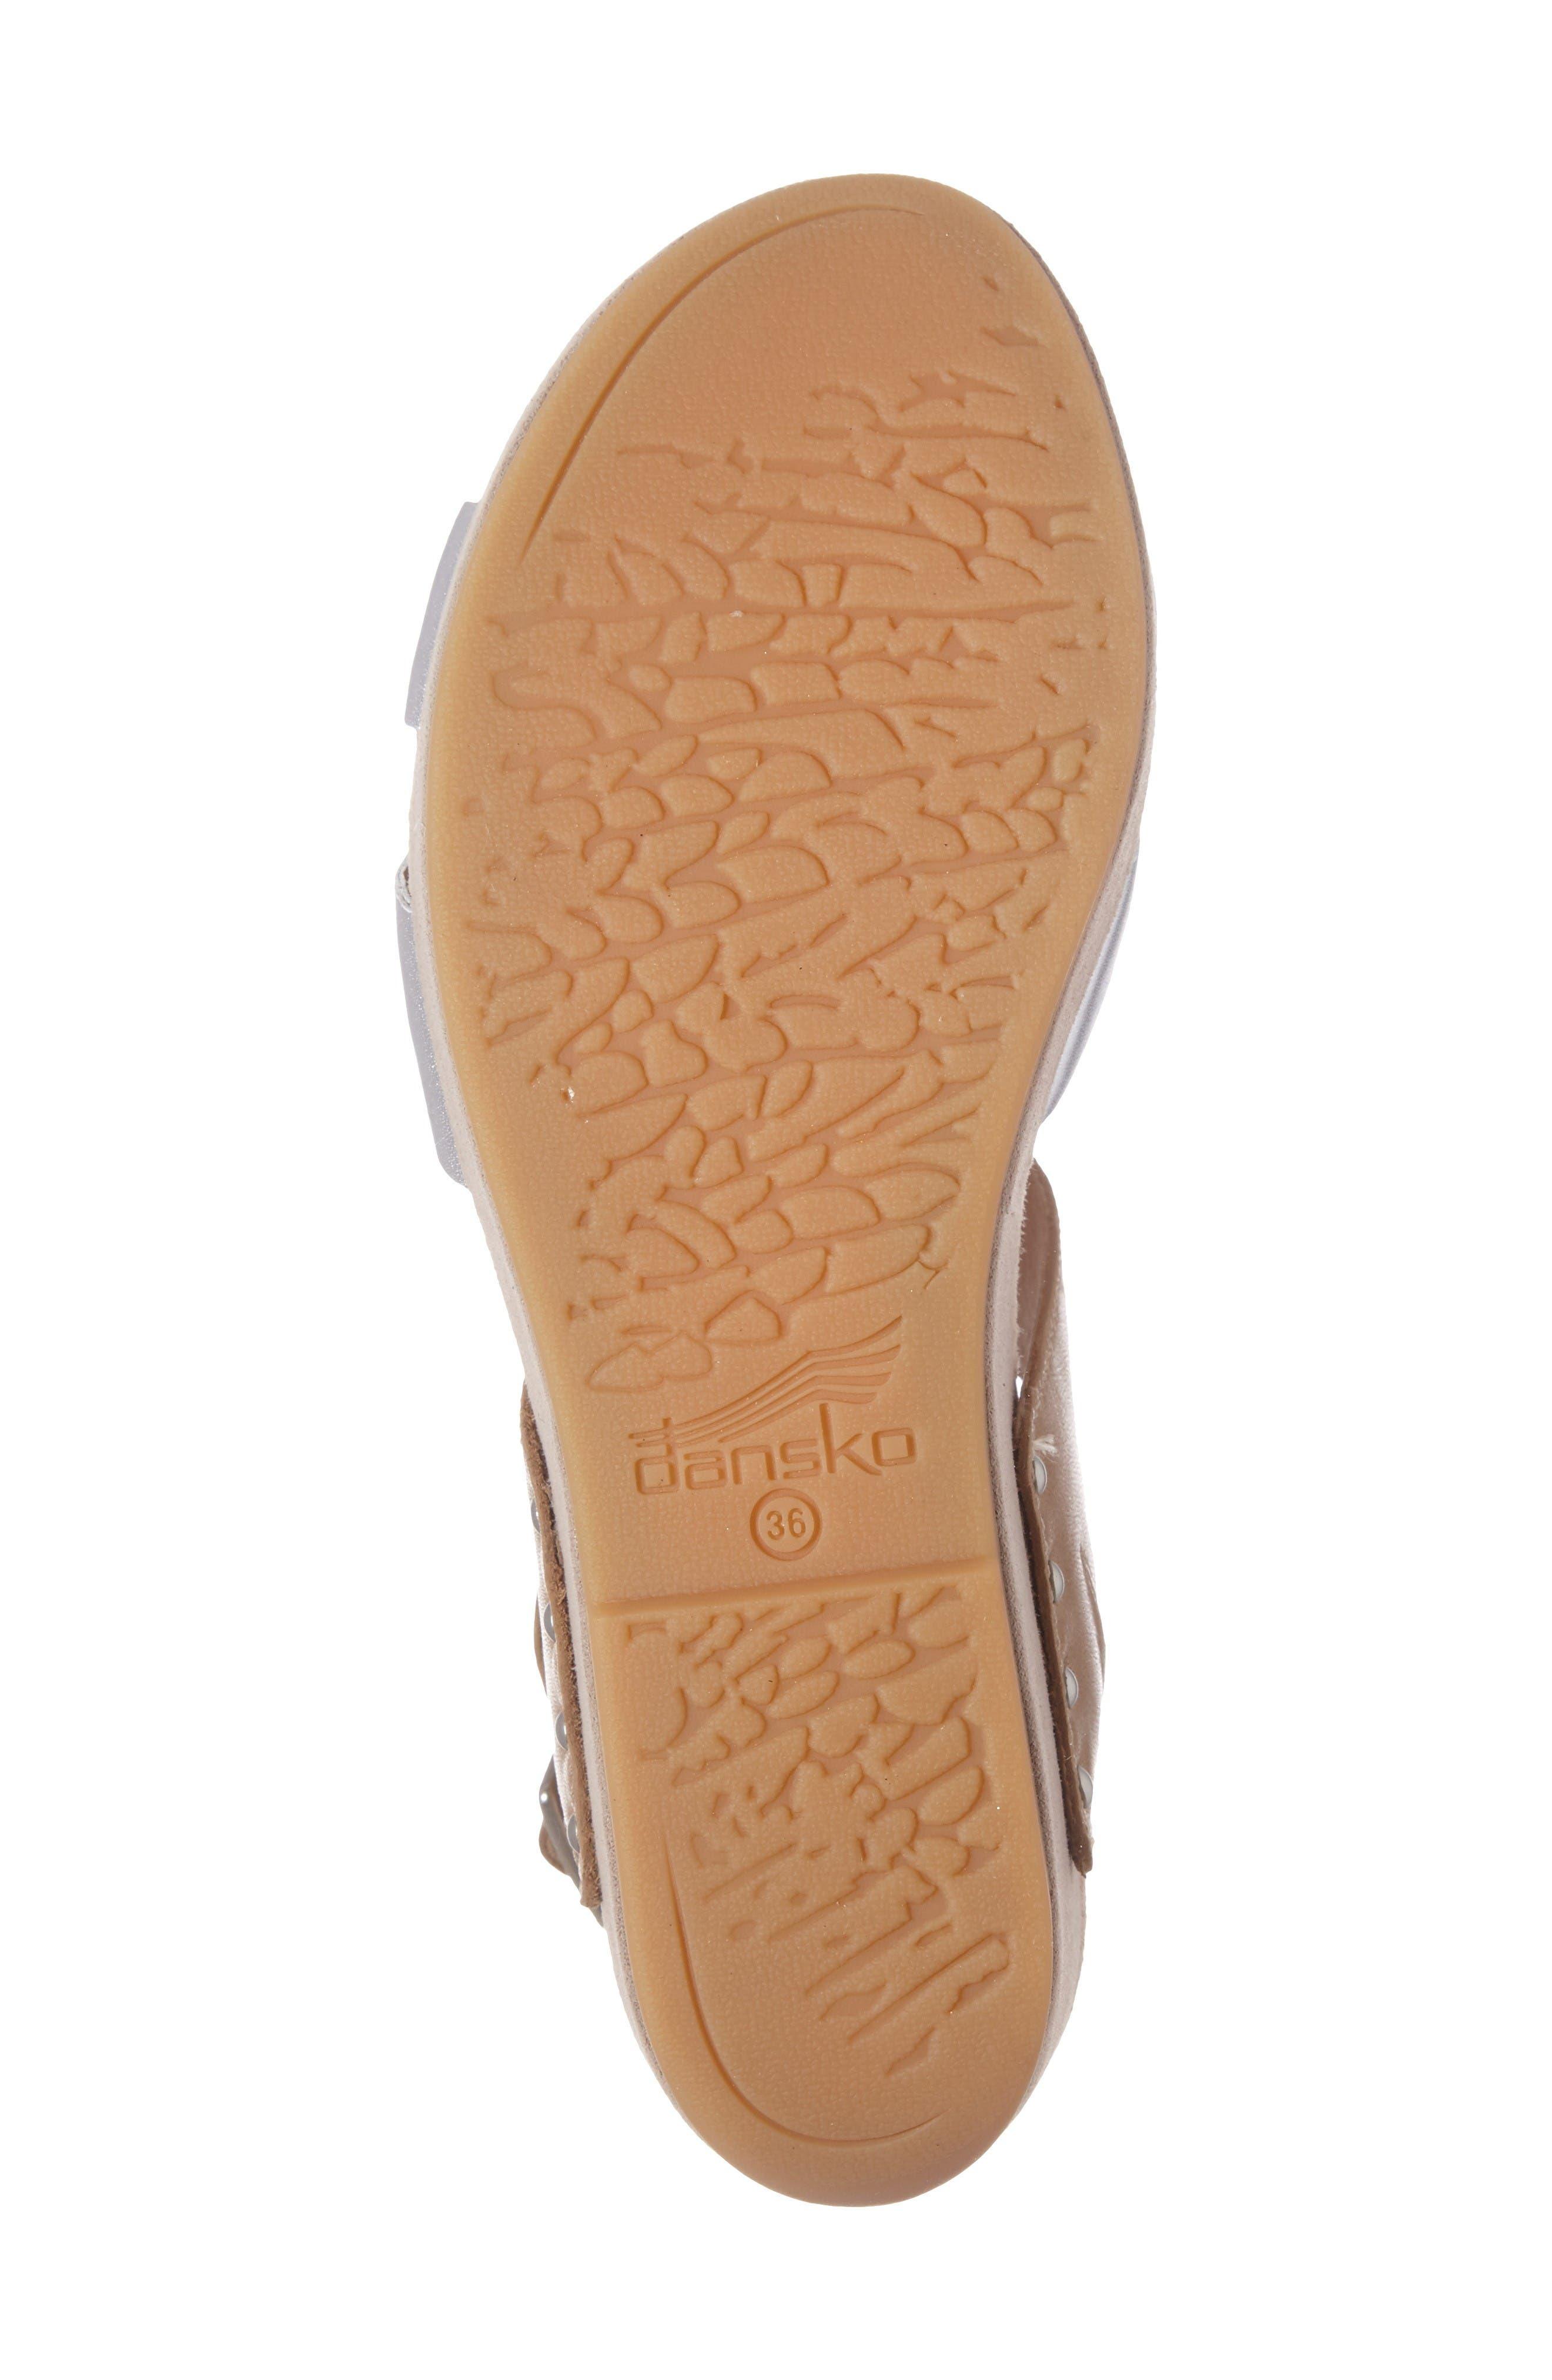 Stasia Platform Wedge Sandal,                             Alternate thumbnail 4, color,                             Sand/ Silver Leather